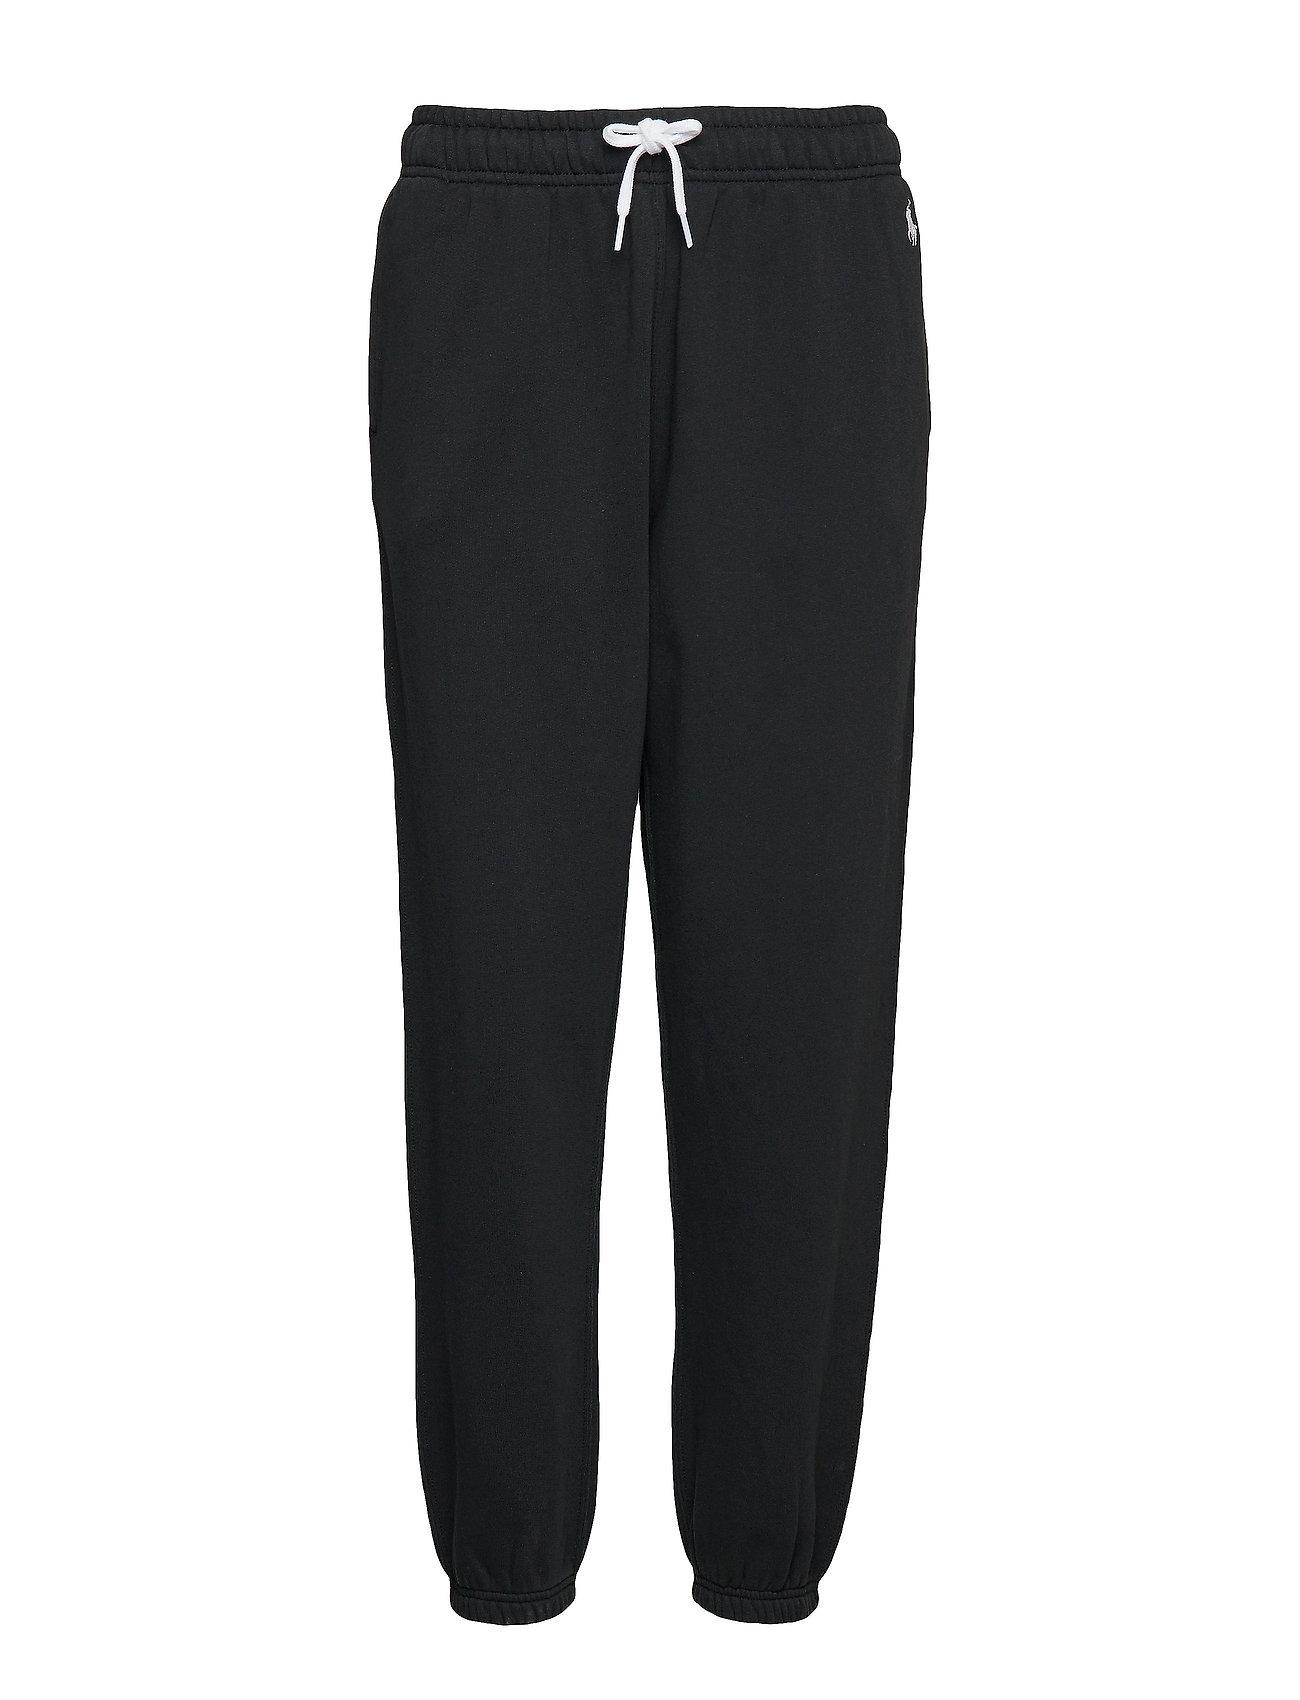 Polo Ralph Lauren Fleece Sweatpant - POLO BLACK